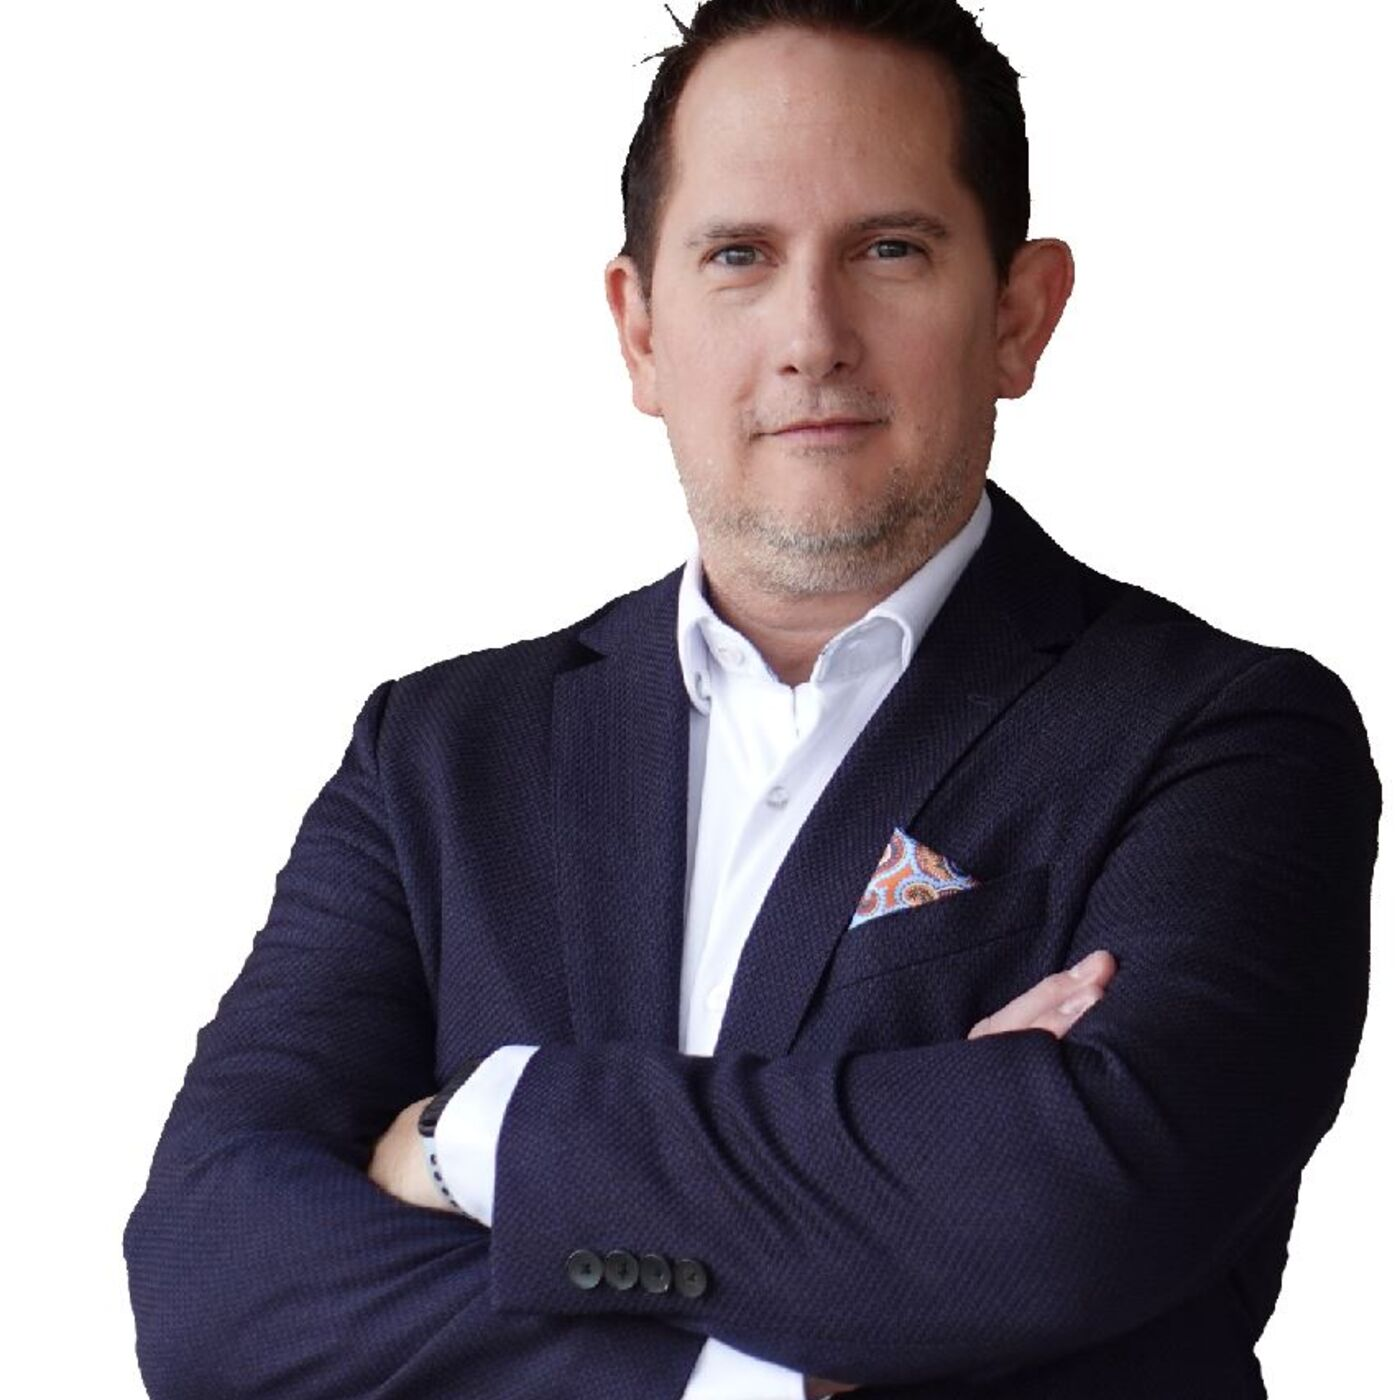 Joe Paranteau - Billion Dollar Sales Secrets